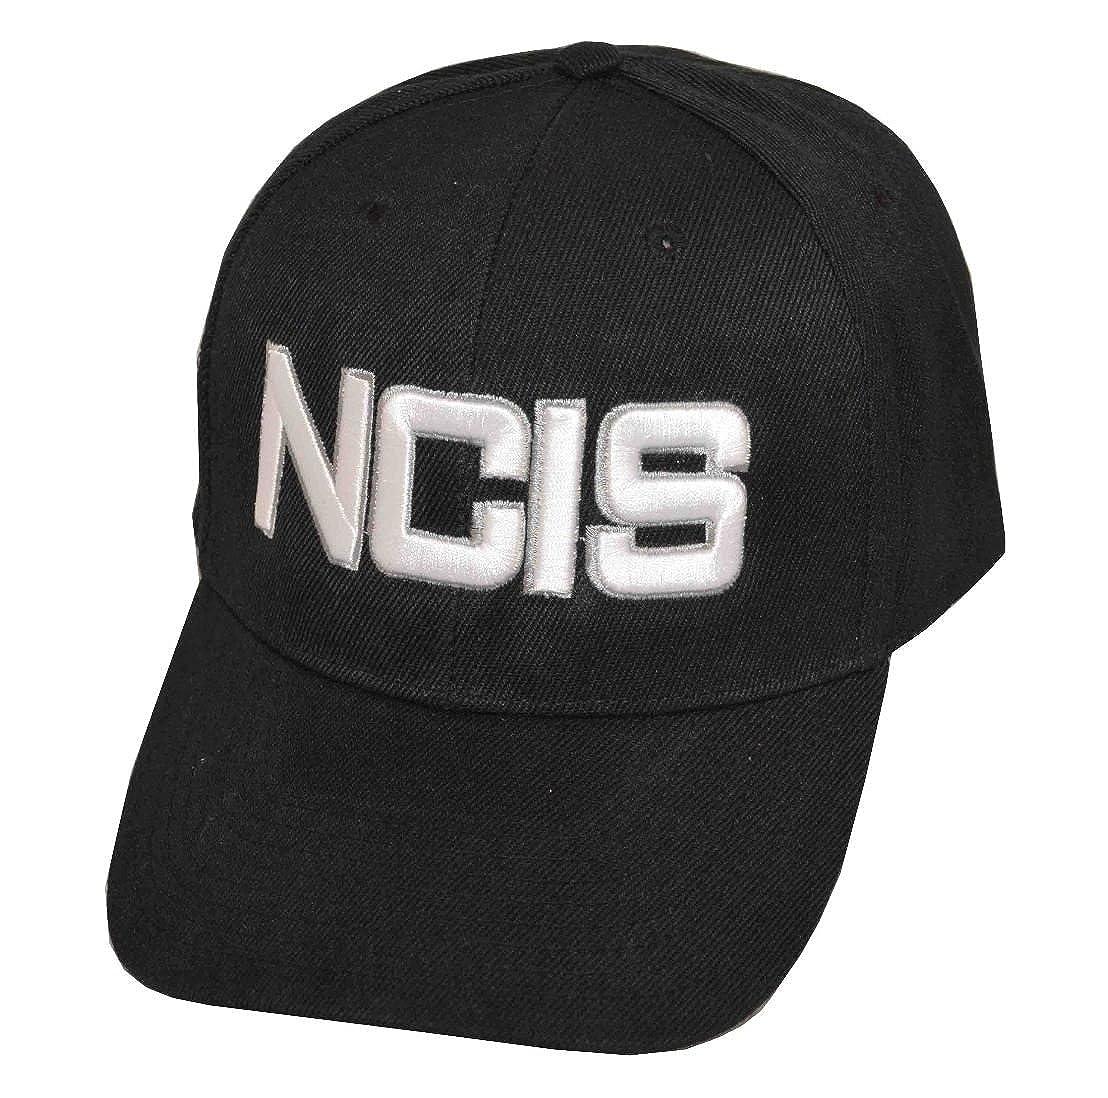 Naval Criminal Investigative Service NCIS Cap Hat-black-adjustable